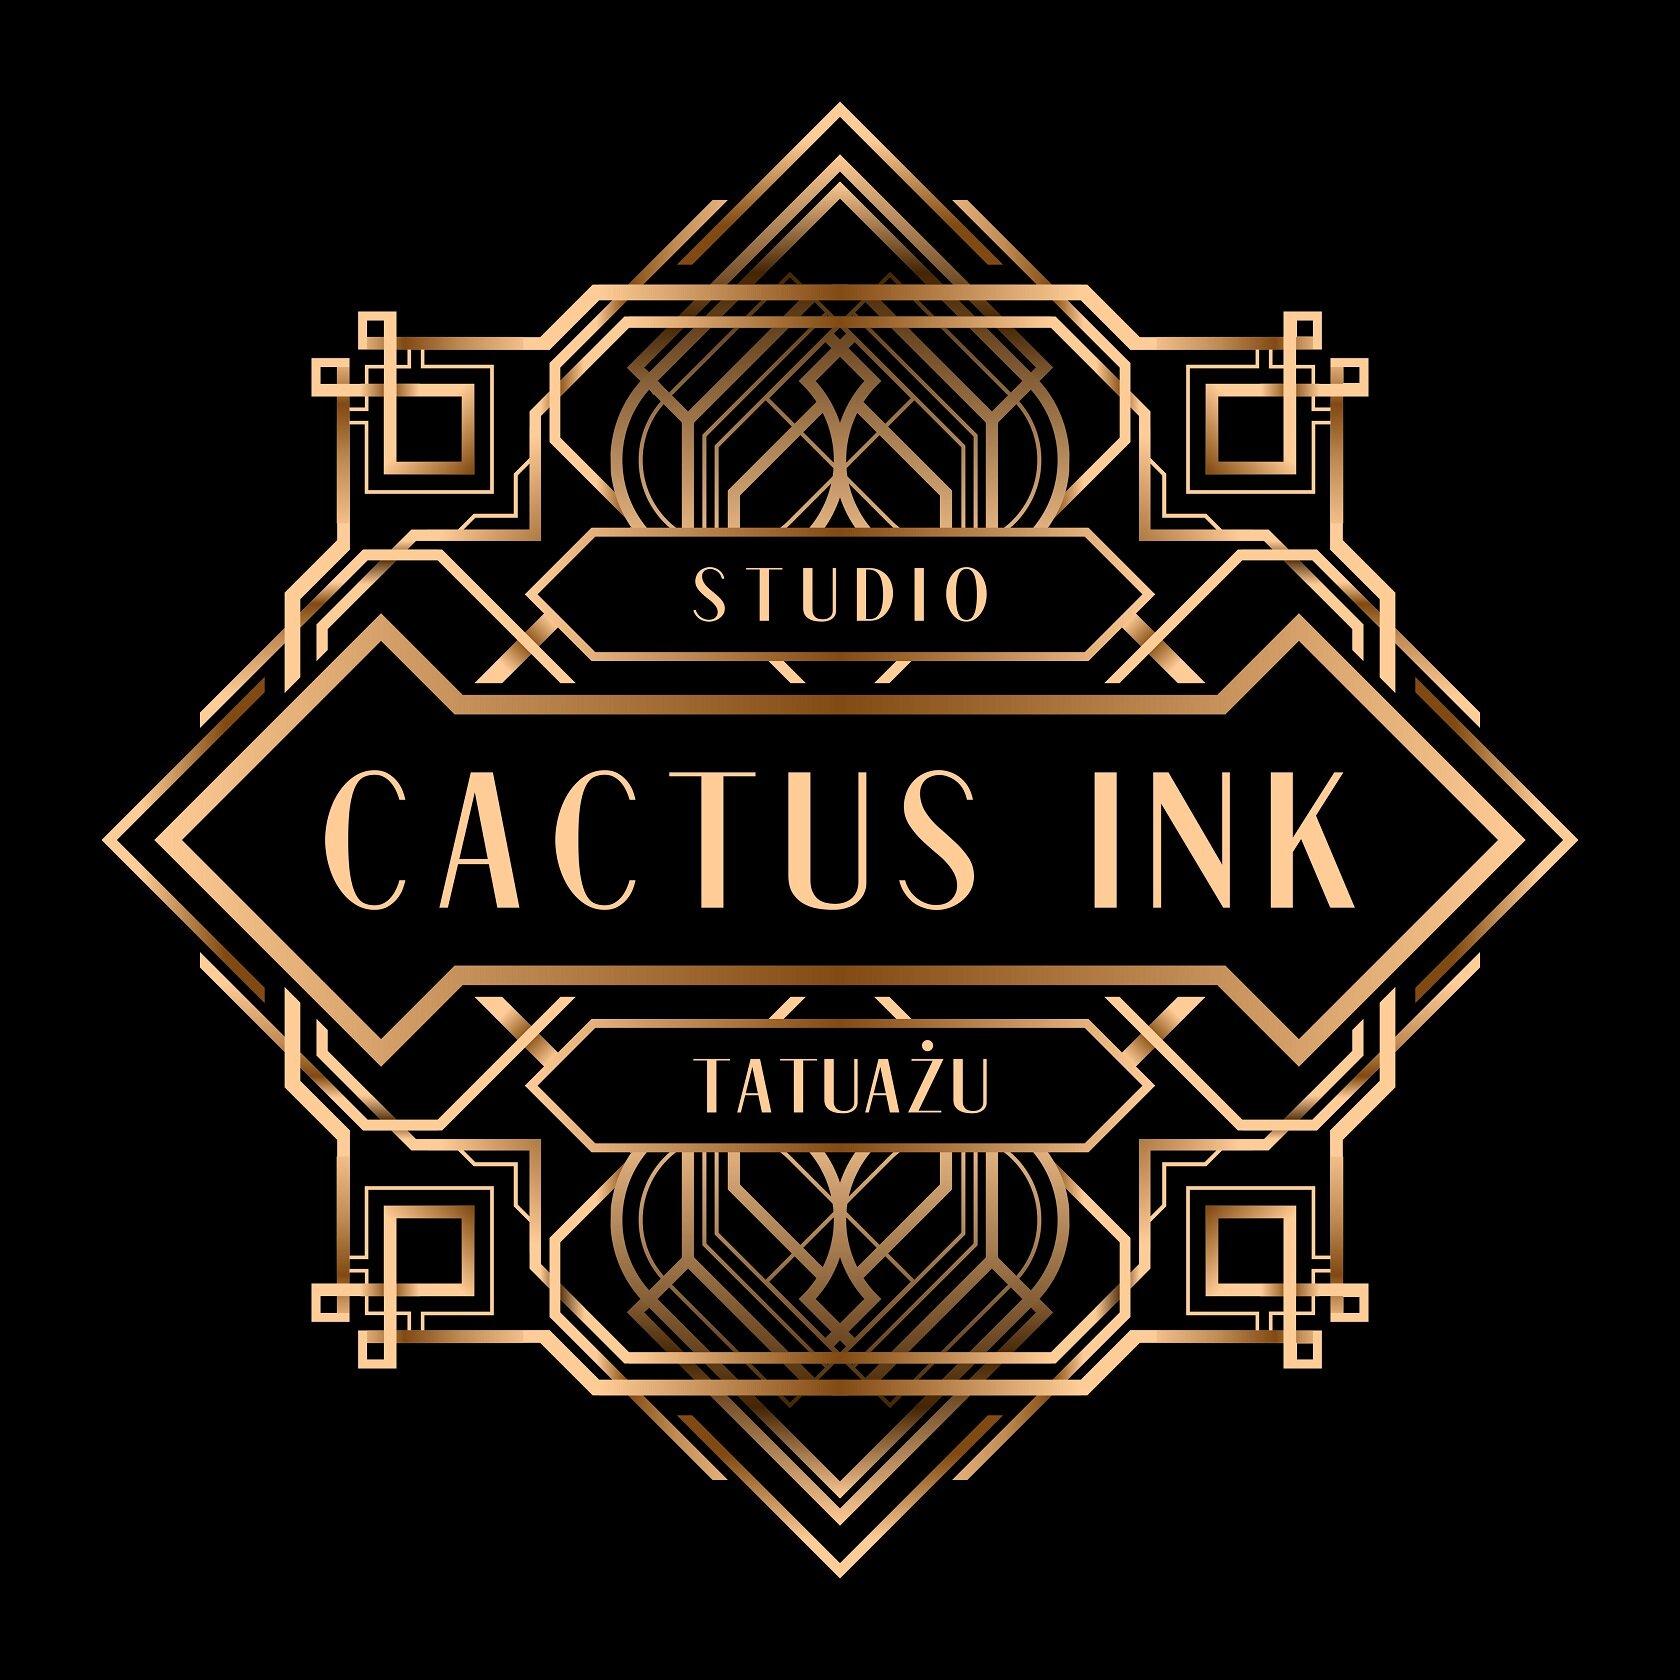 CactusInk-logo